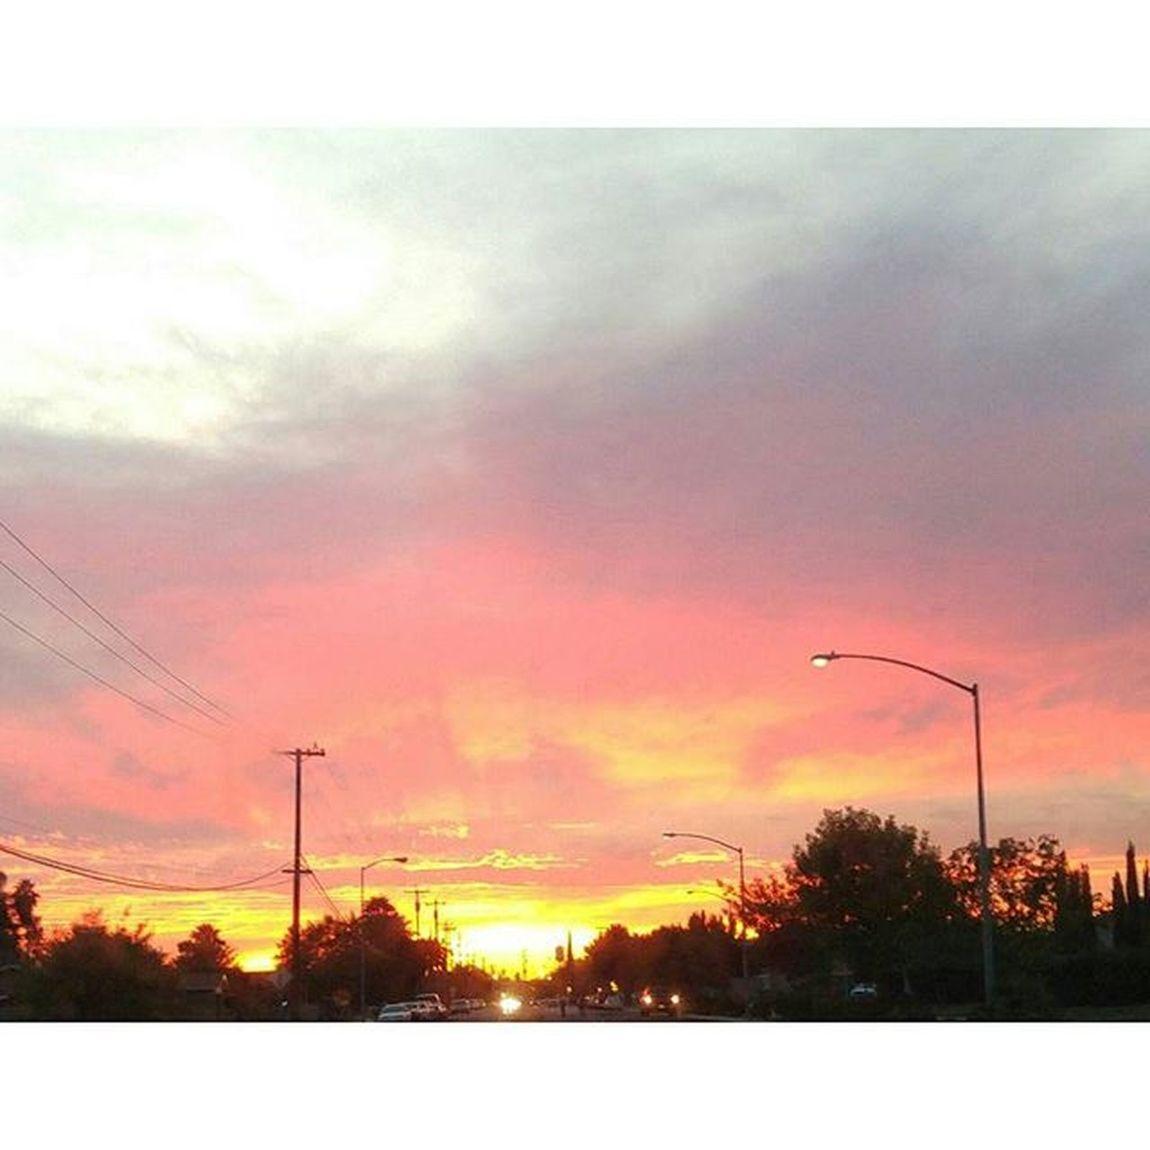 Yesterday.... Sunset_madness Sunset Sunday Sky Cloudporn BeautifulSunset 559 Love Sunrise_sunsets_aroundworld Beautifulsky All_sunsets California Photo Skyporn Calisky Myview Skies Loveit Beautiful Madera